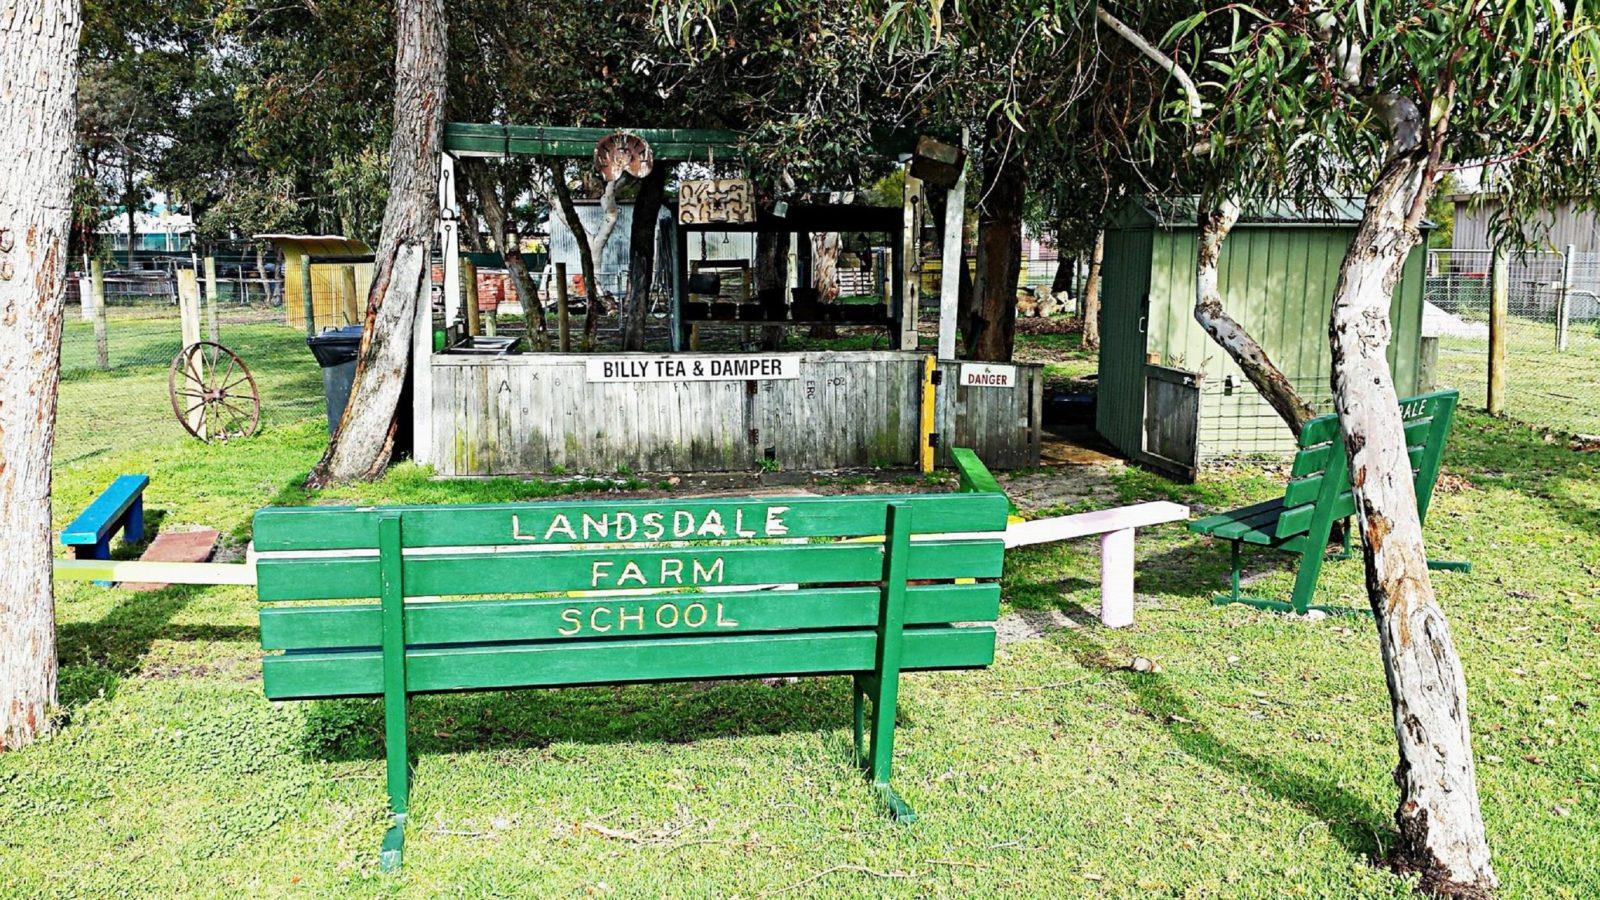 Landsdale Farm School, Darch, Western Australia